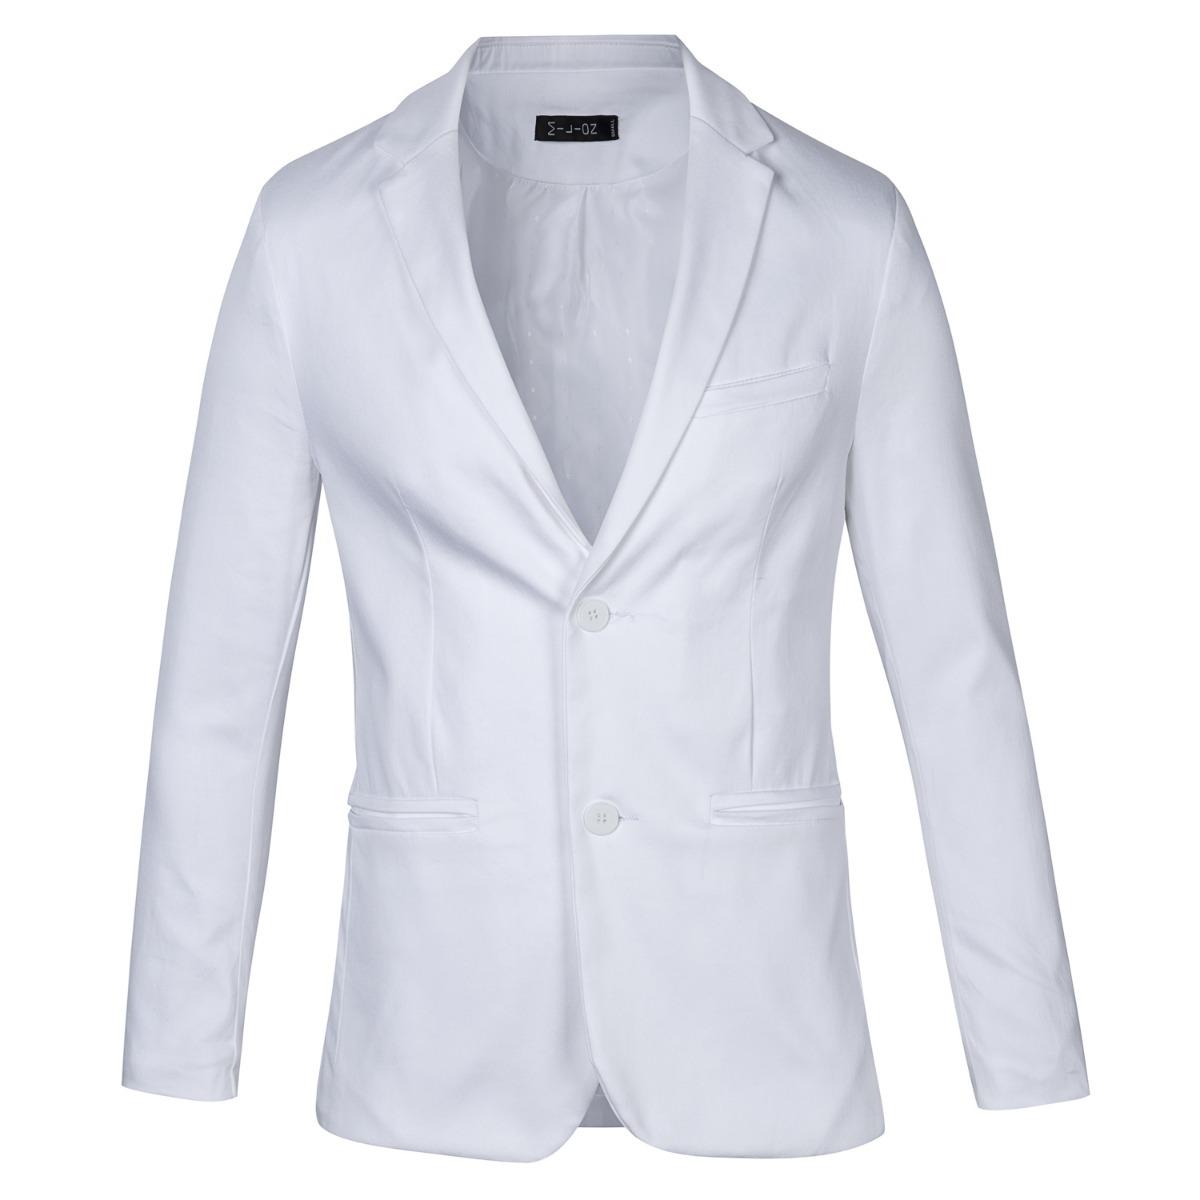 806dbd65 Pantalon Chupin Con Saco Camisa Y Zapatos Charol Import - $ 6.999,00 en  Mercado Libre